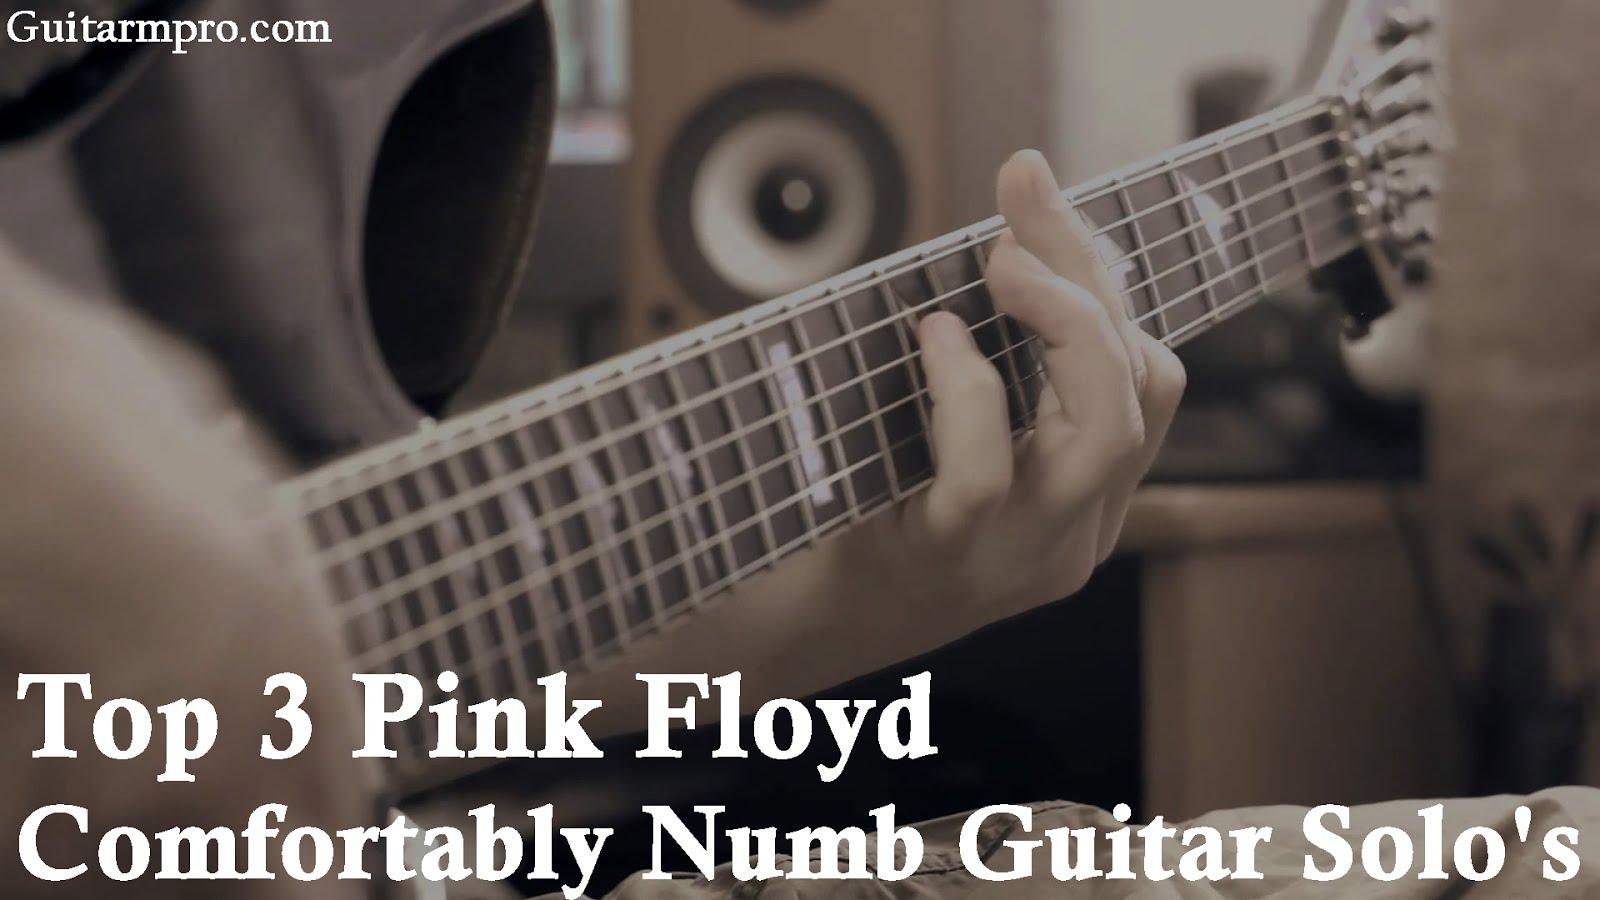 Top 3 Pink Floyd Comfortably Numb Guitar Solos Guitar Music Pro